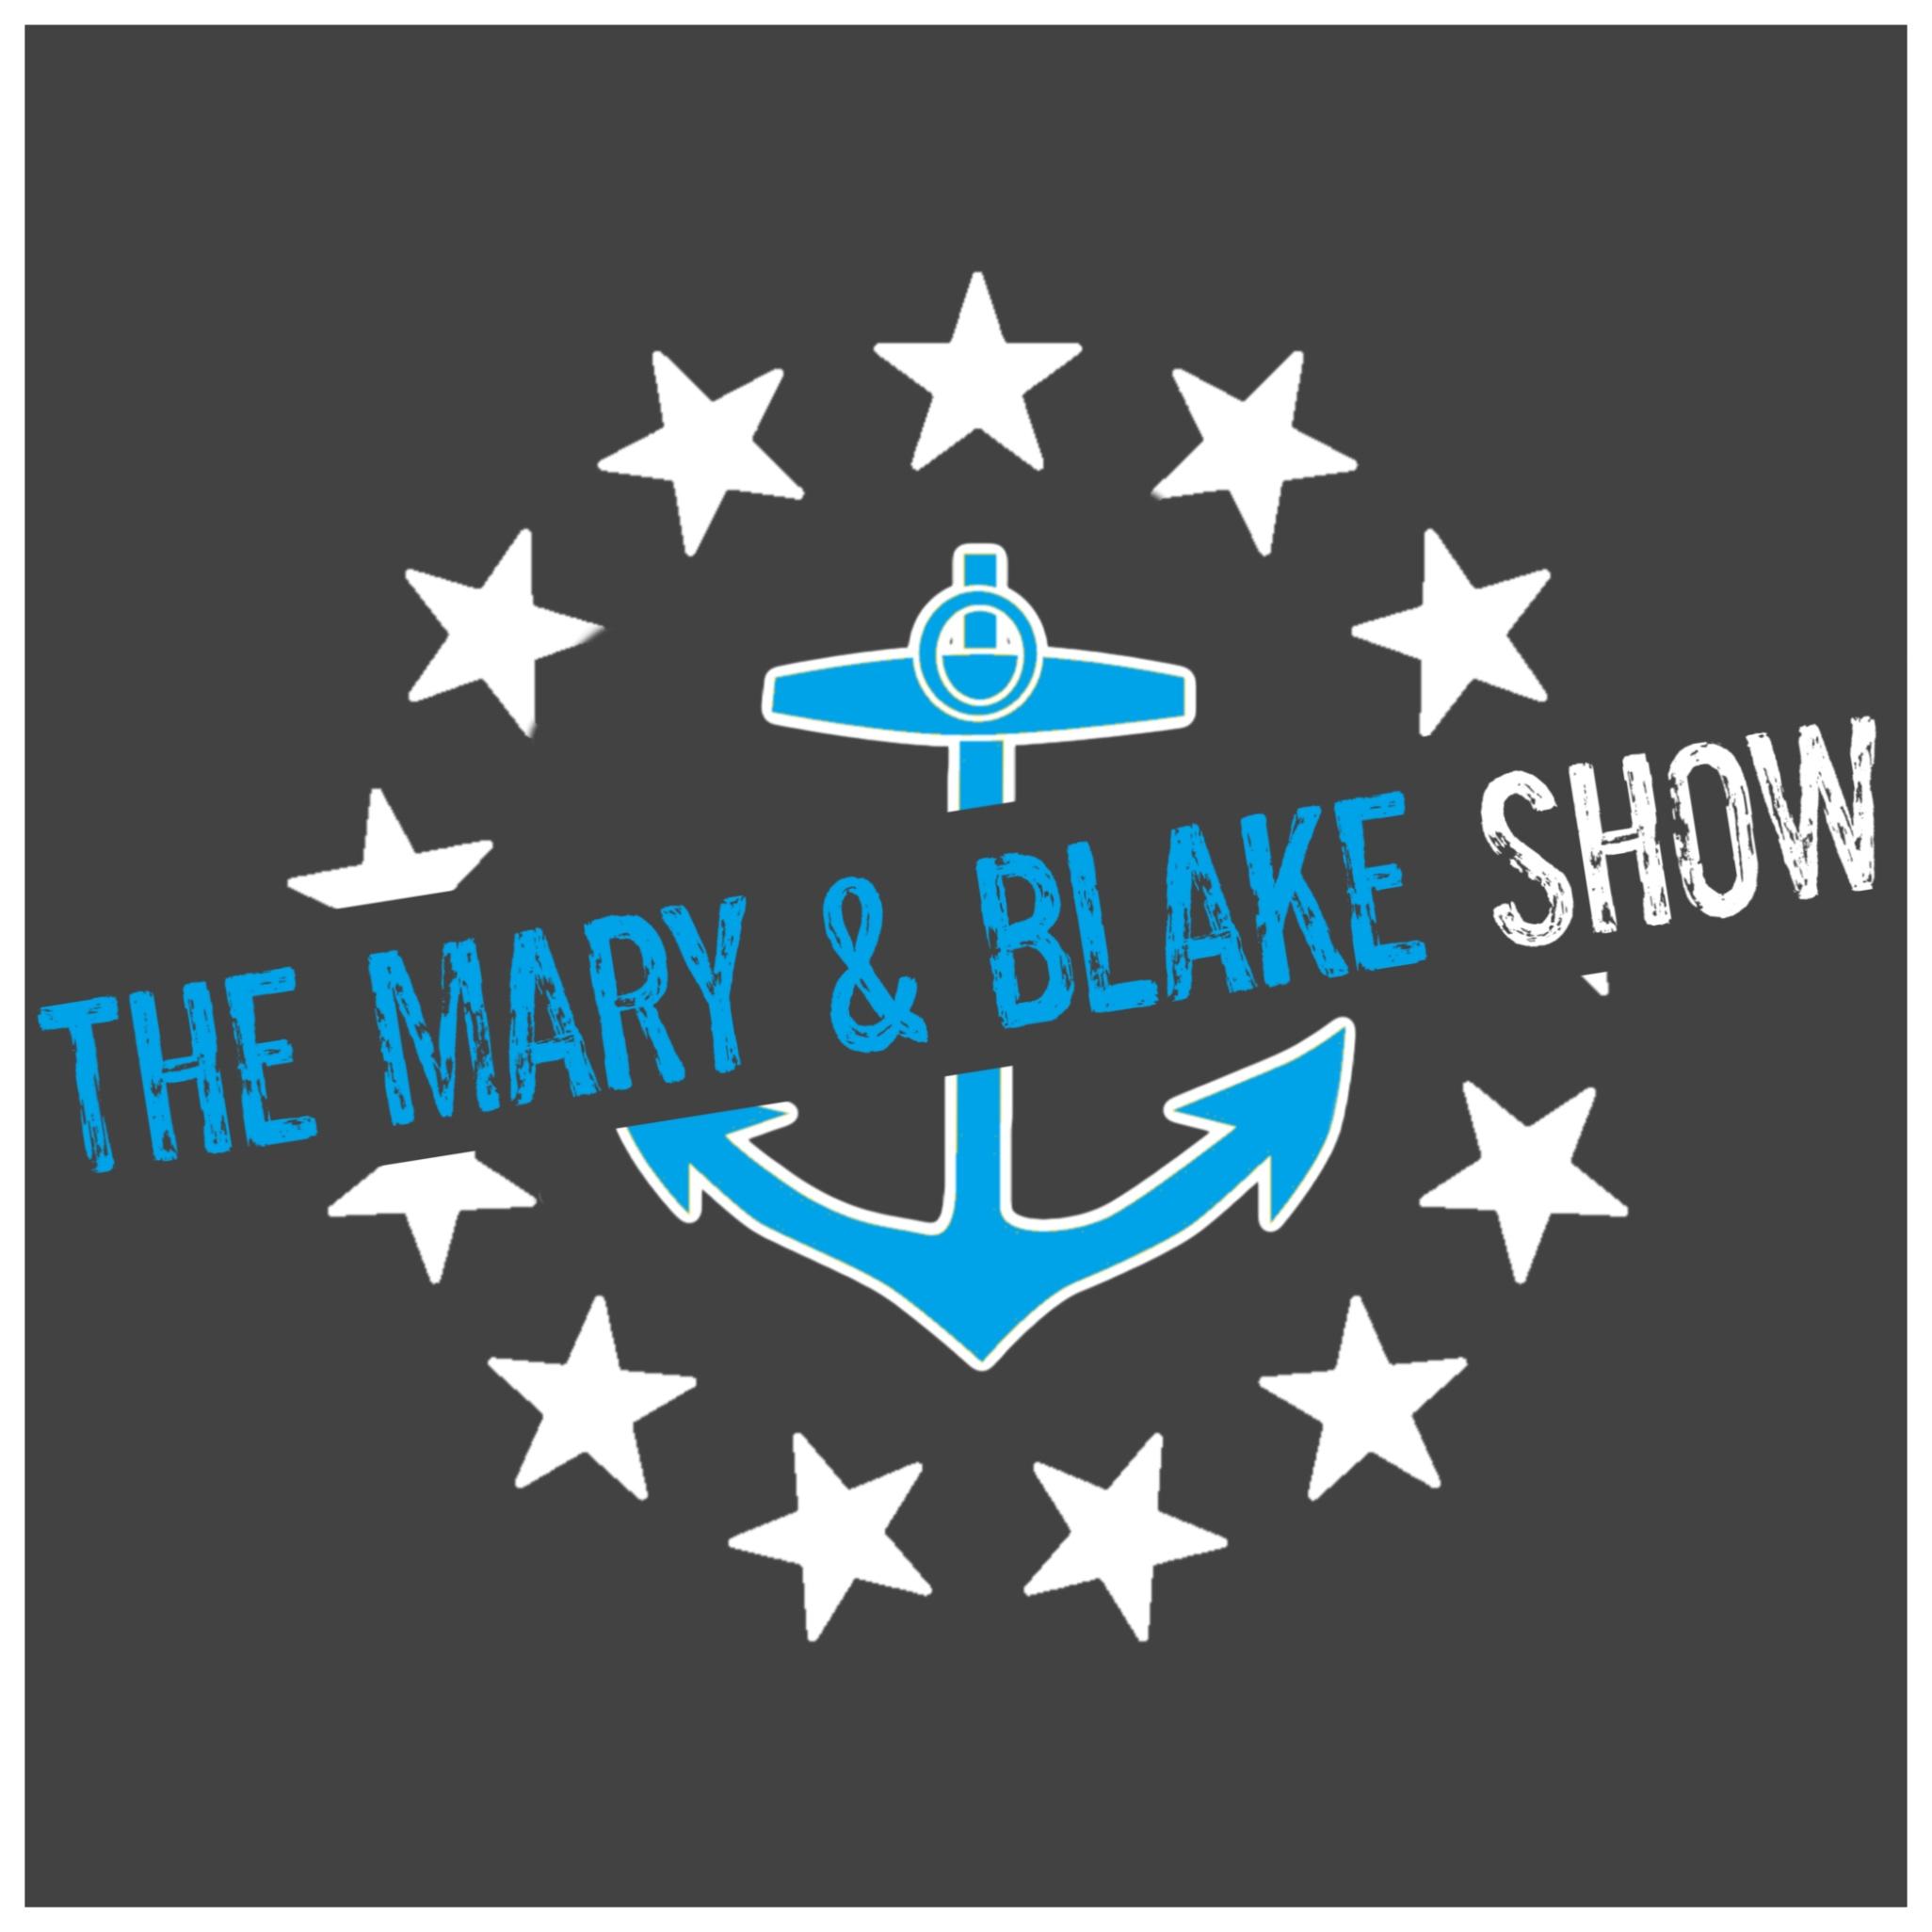 The Mary & Blake Show Art